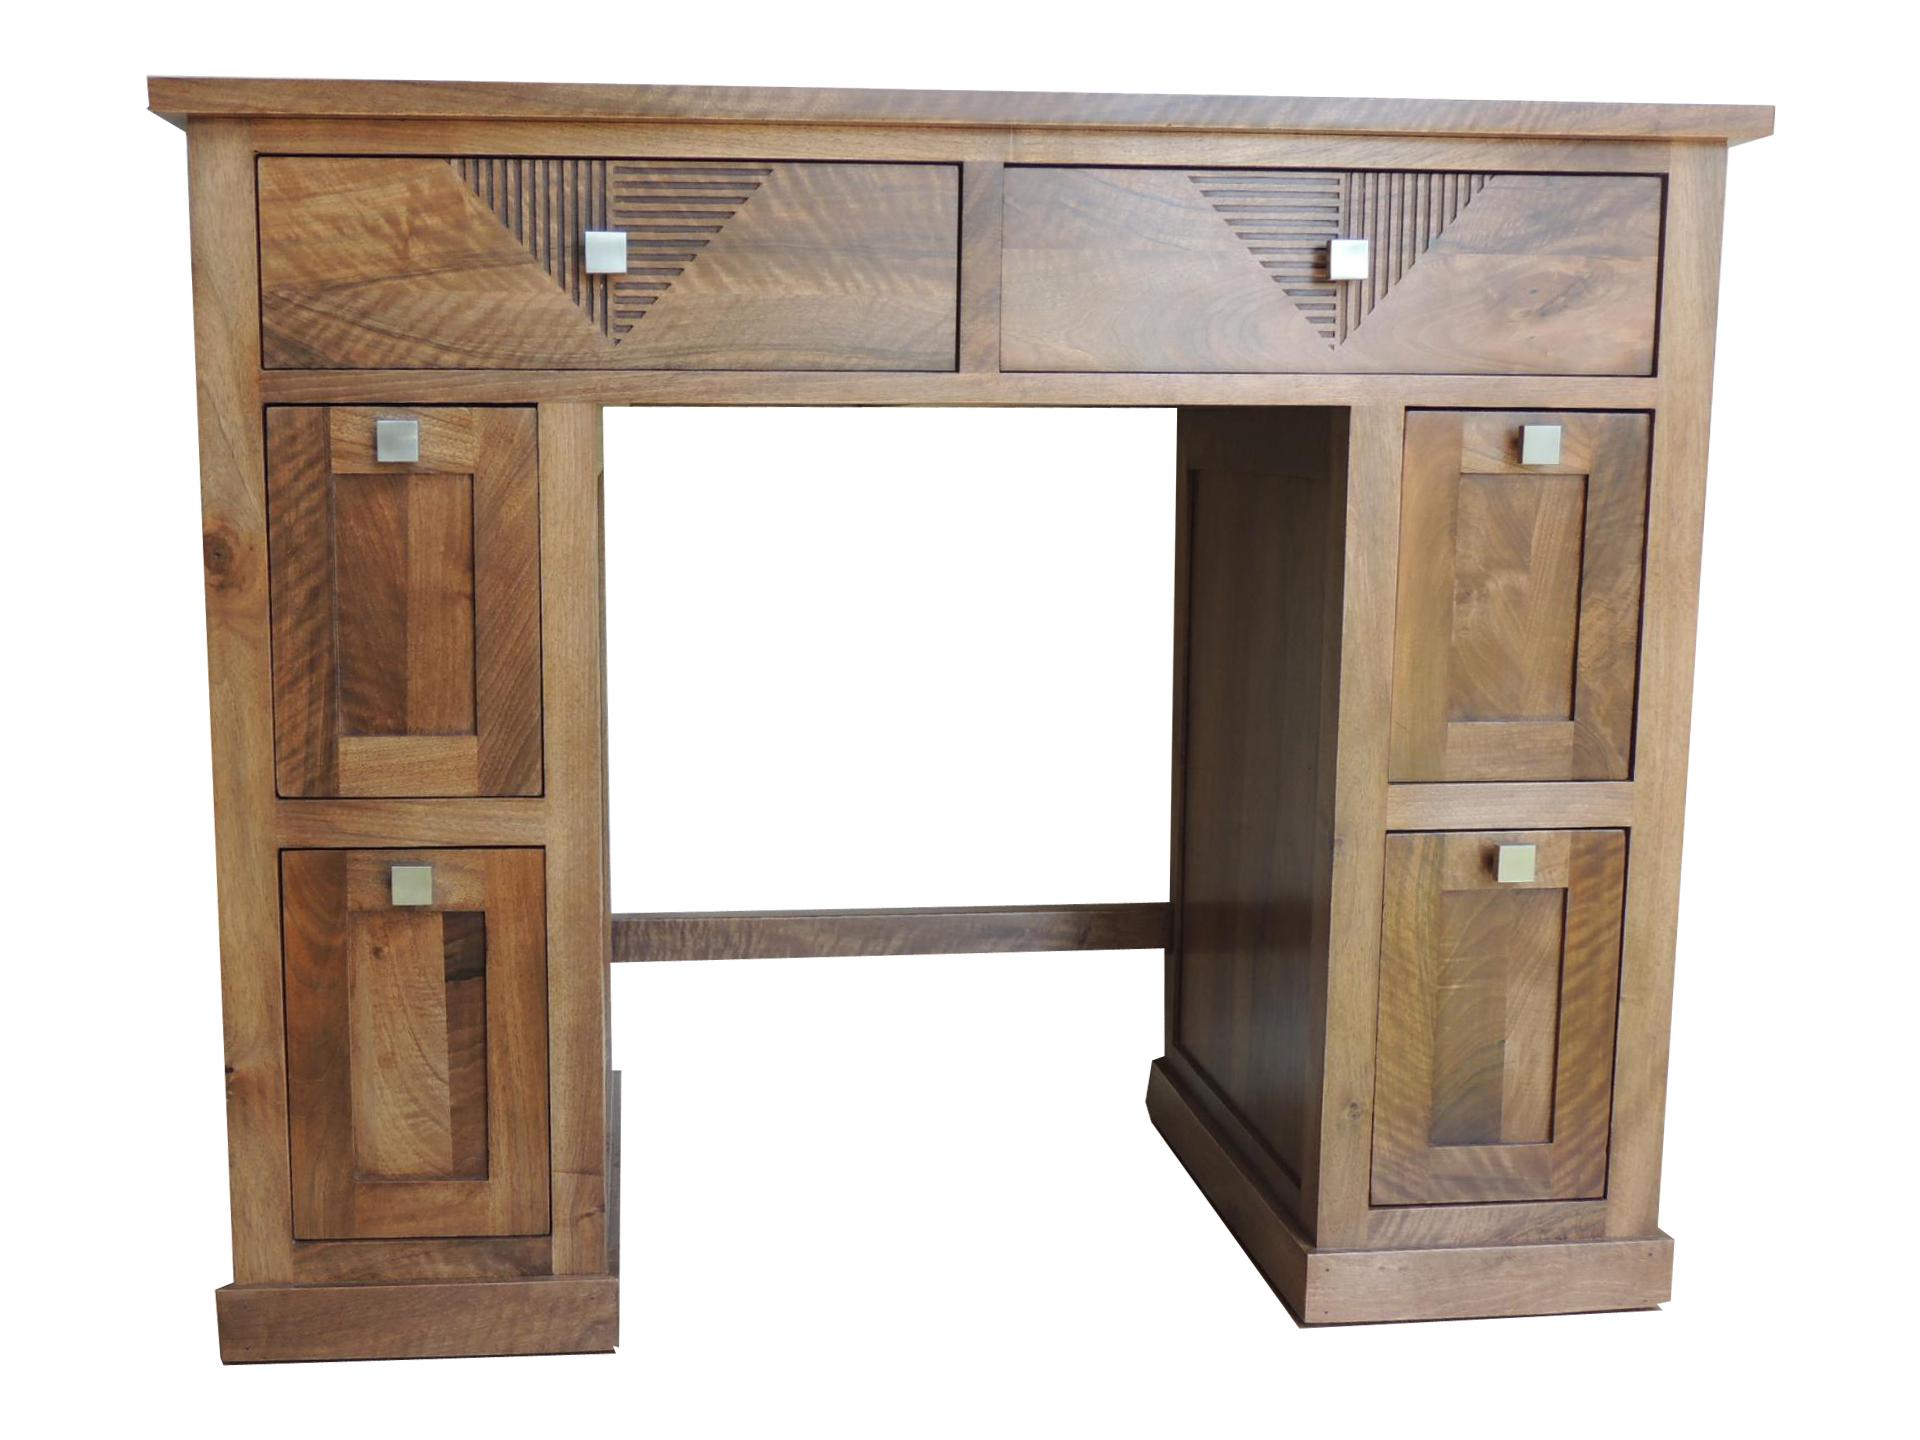 ateliercannelle.com - walnut dressing table